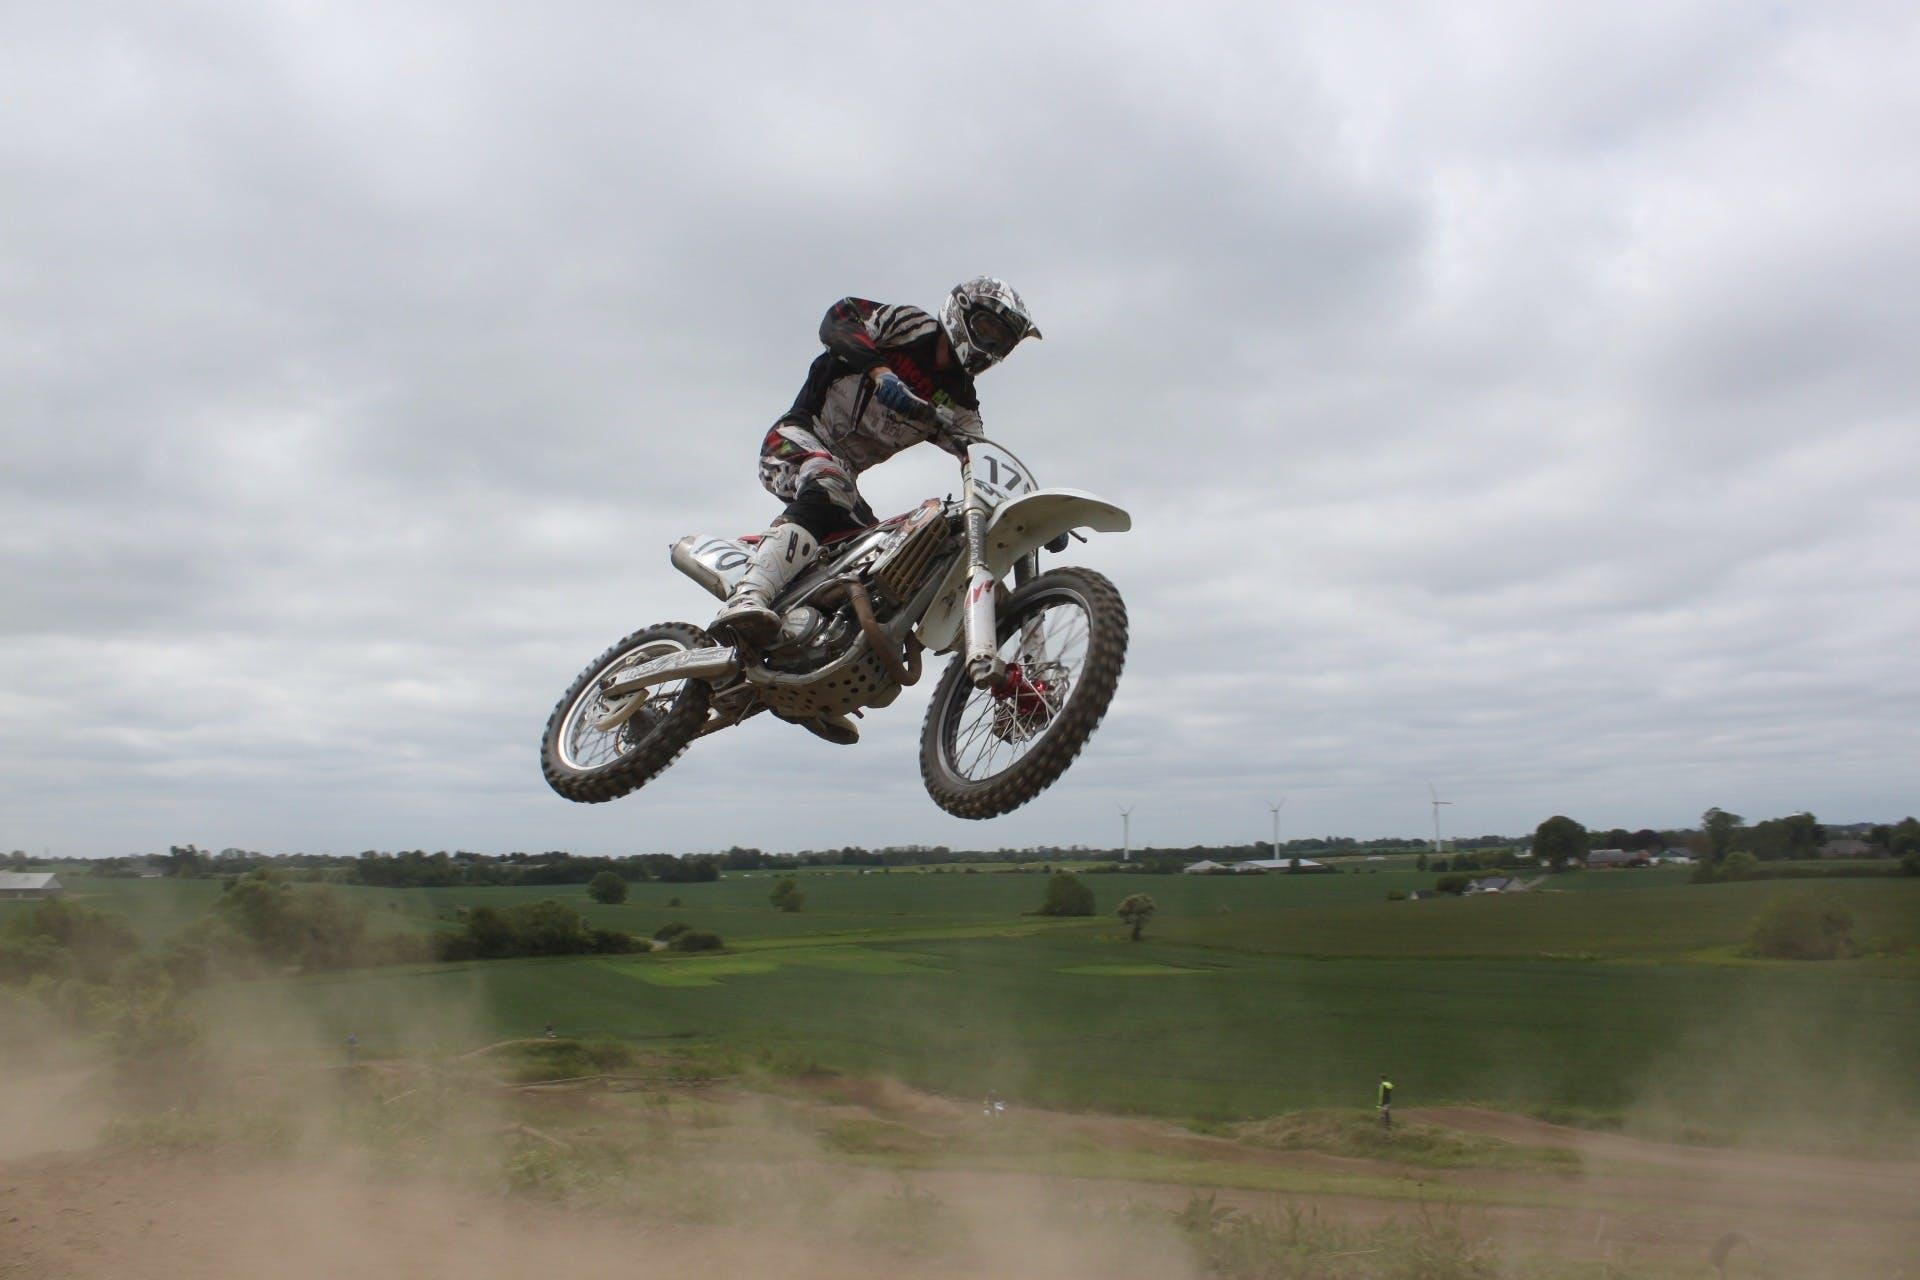 Man Riding Moto Cross Bike Doing Tricks Mid Air Under Cloudy Skies during Daytime